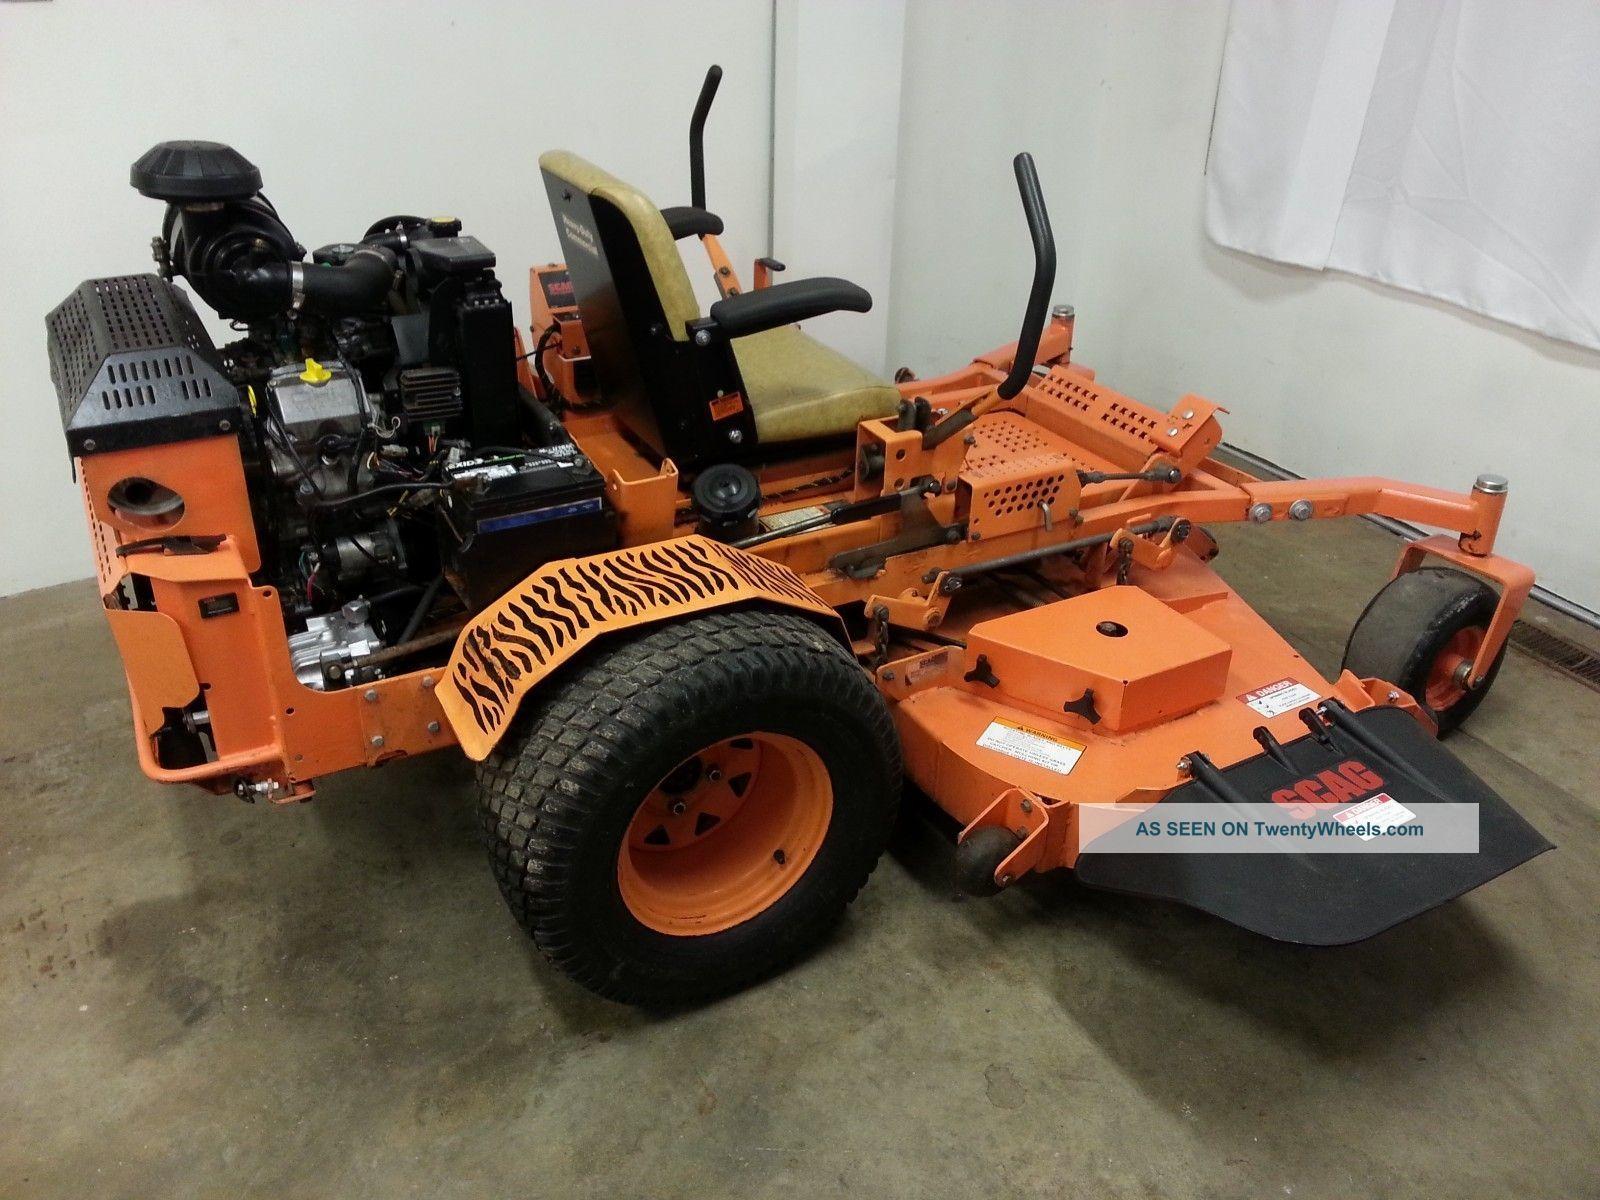 Scag Lawn Mowers At Lawn Tamer Inc. Call8637635606